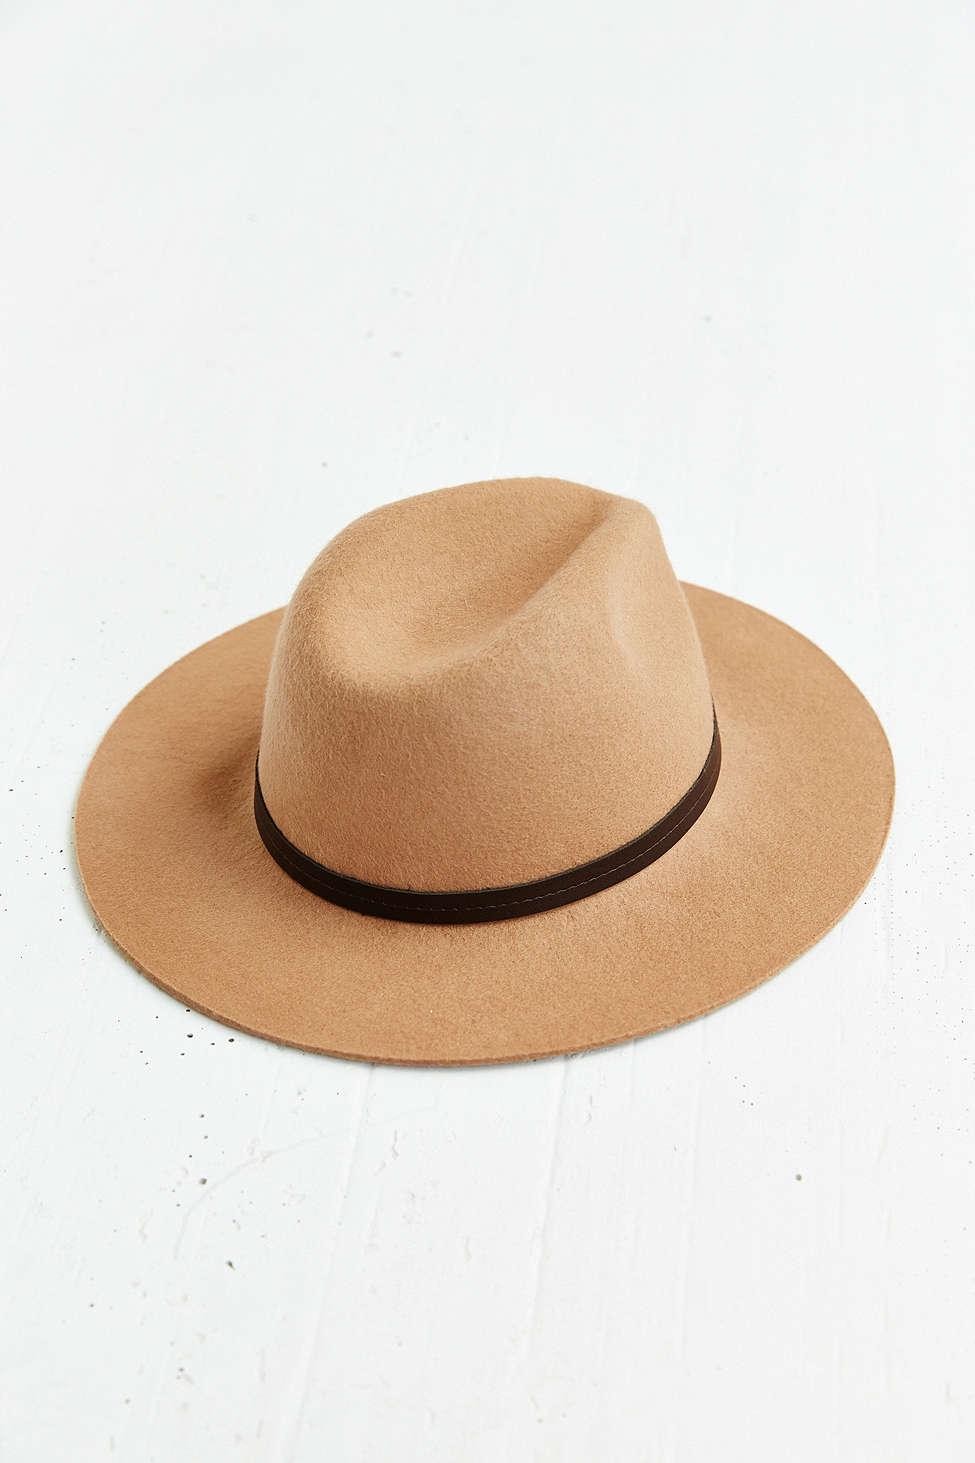 urban hat.jpg